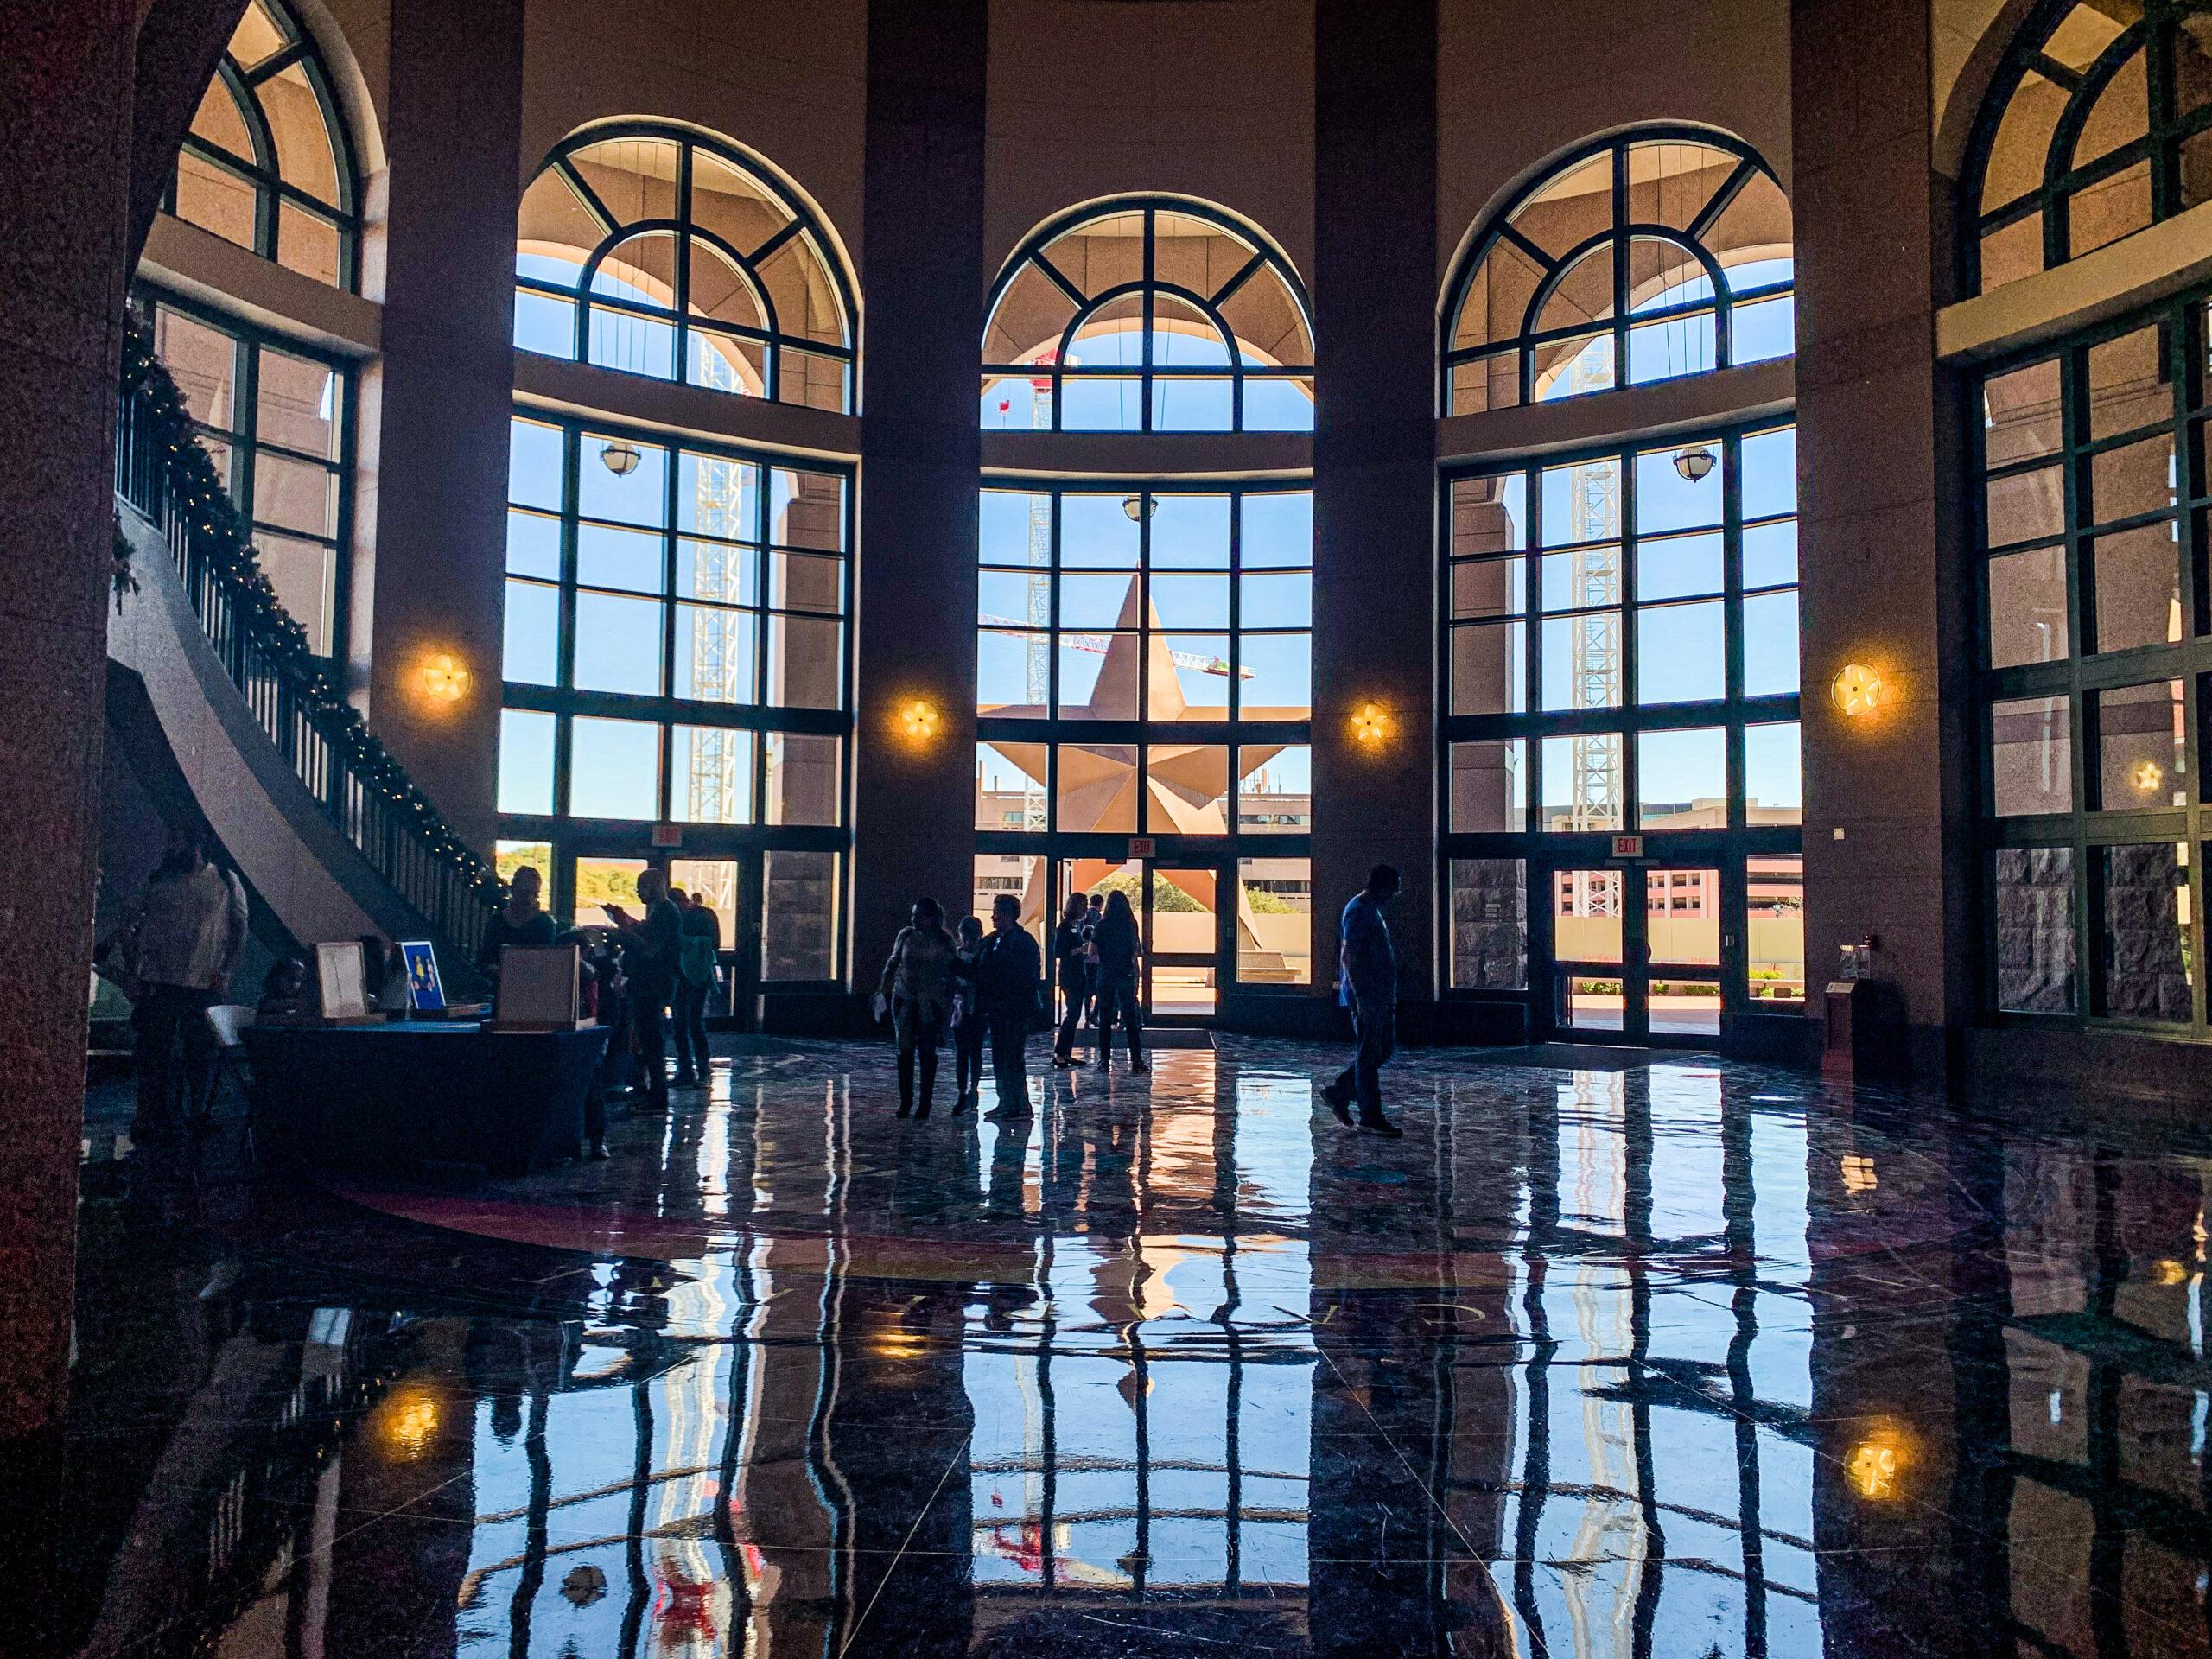 bullock texas state historymuseum